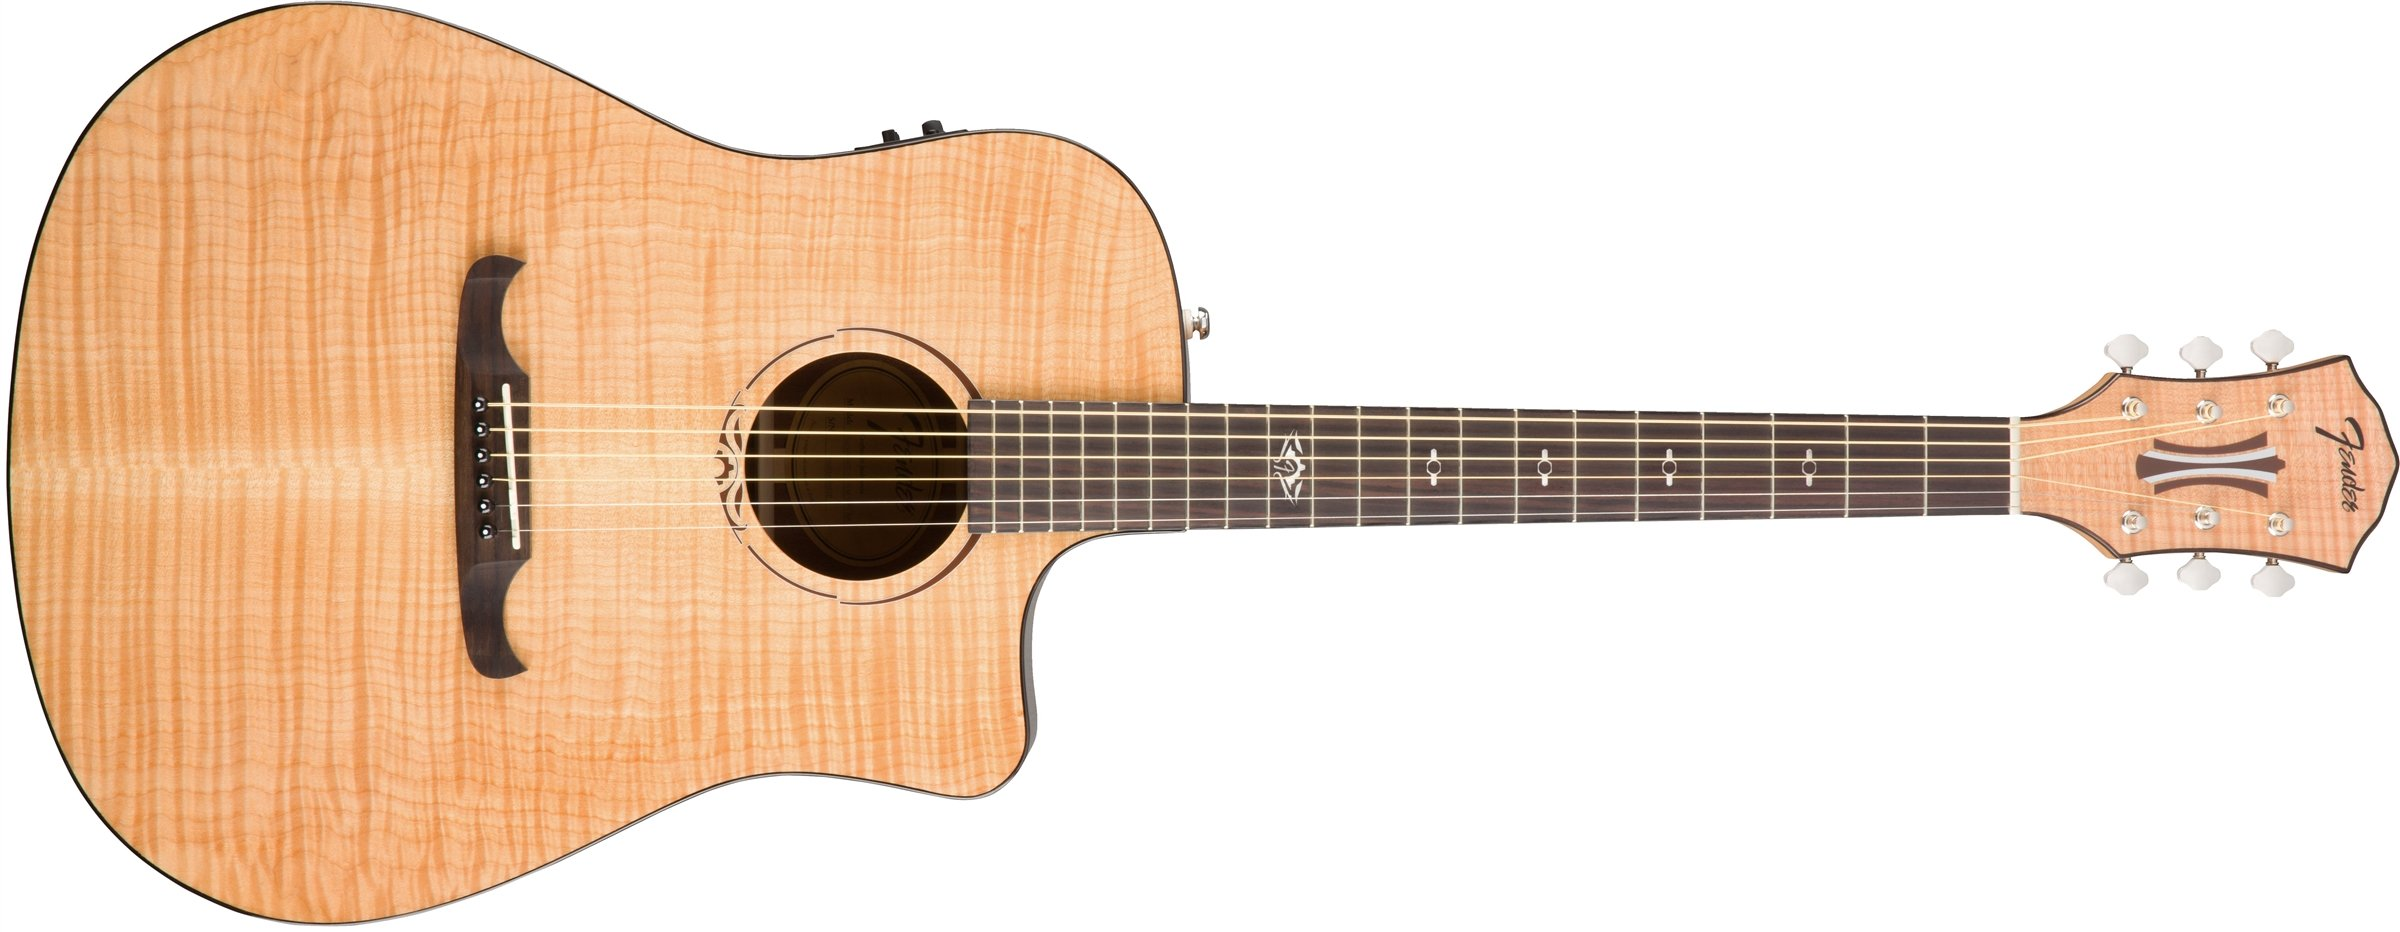 Fender T-Bucket 400 Acoustic Electric Guitar, Rosewood Fingerboard - Natural